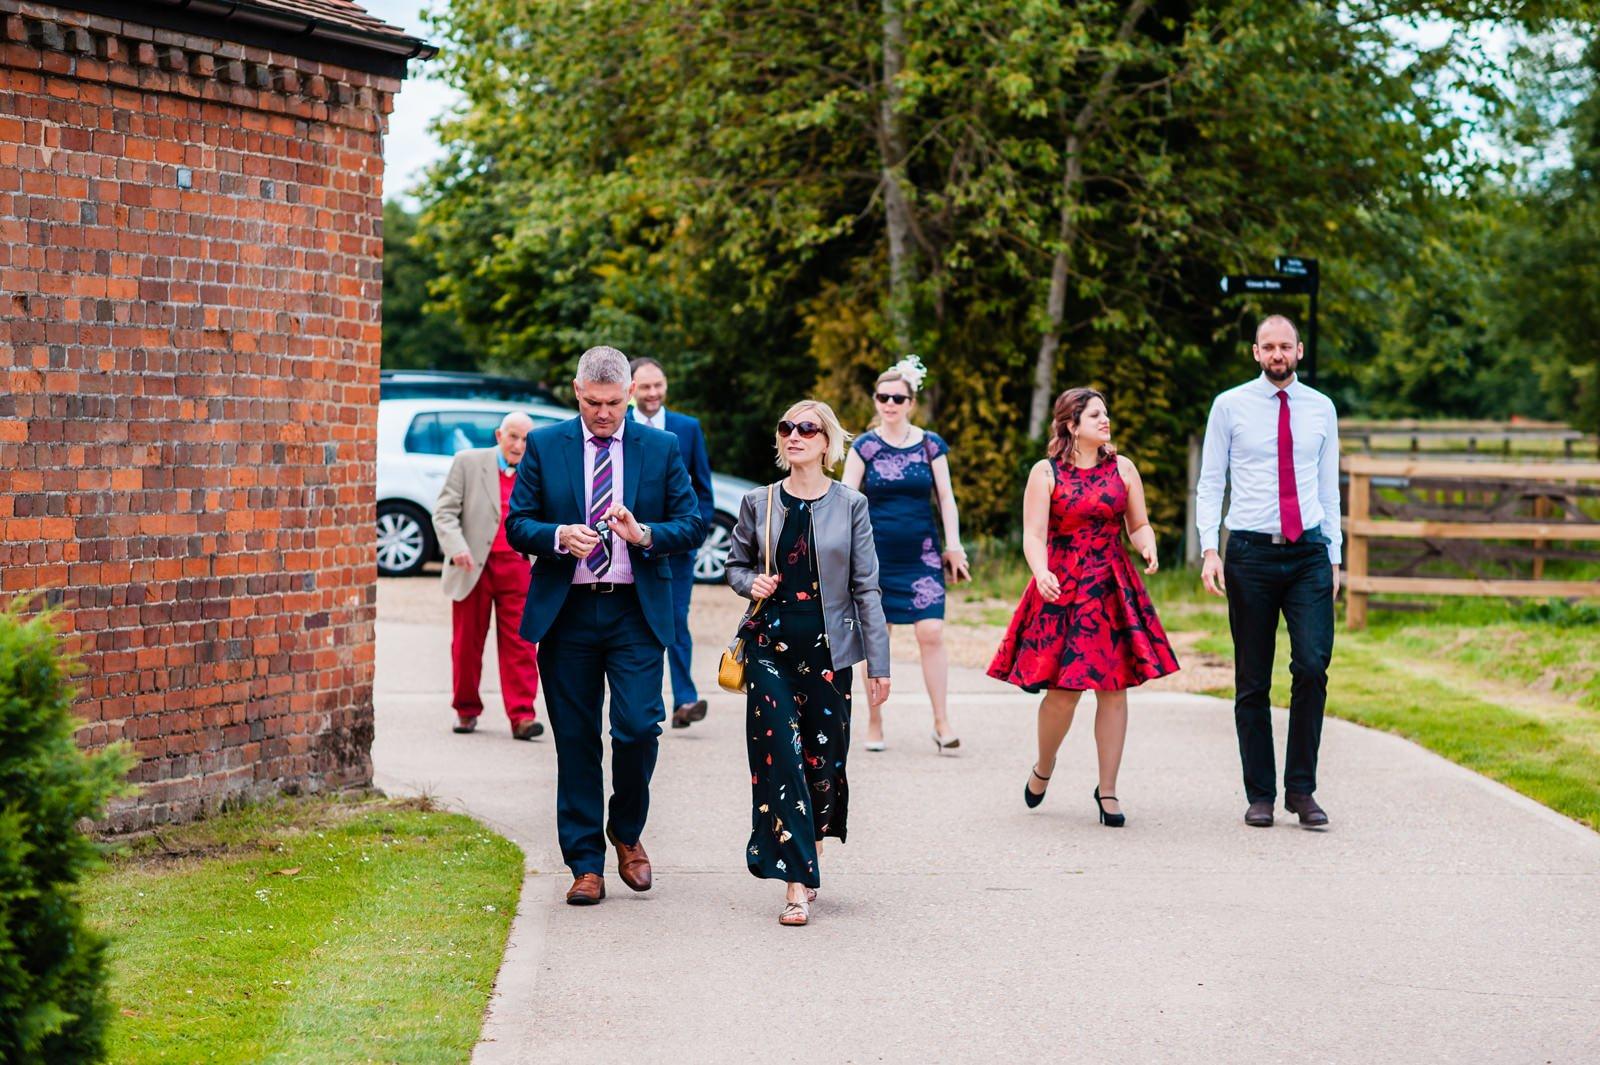 Beautiful Lillibrooke Manor Wedding - Ksenia & Iain 55